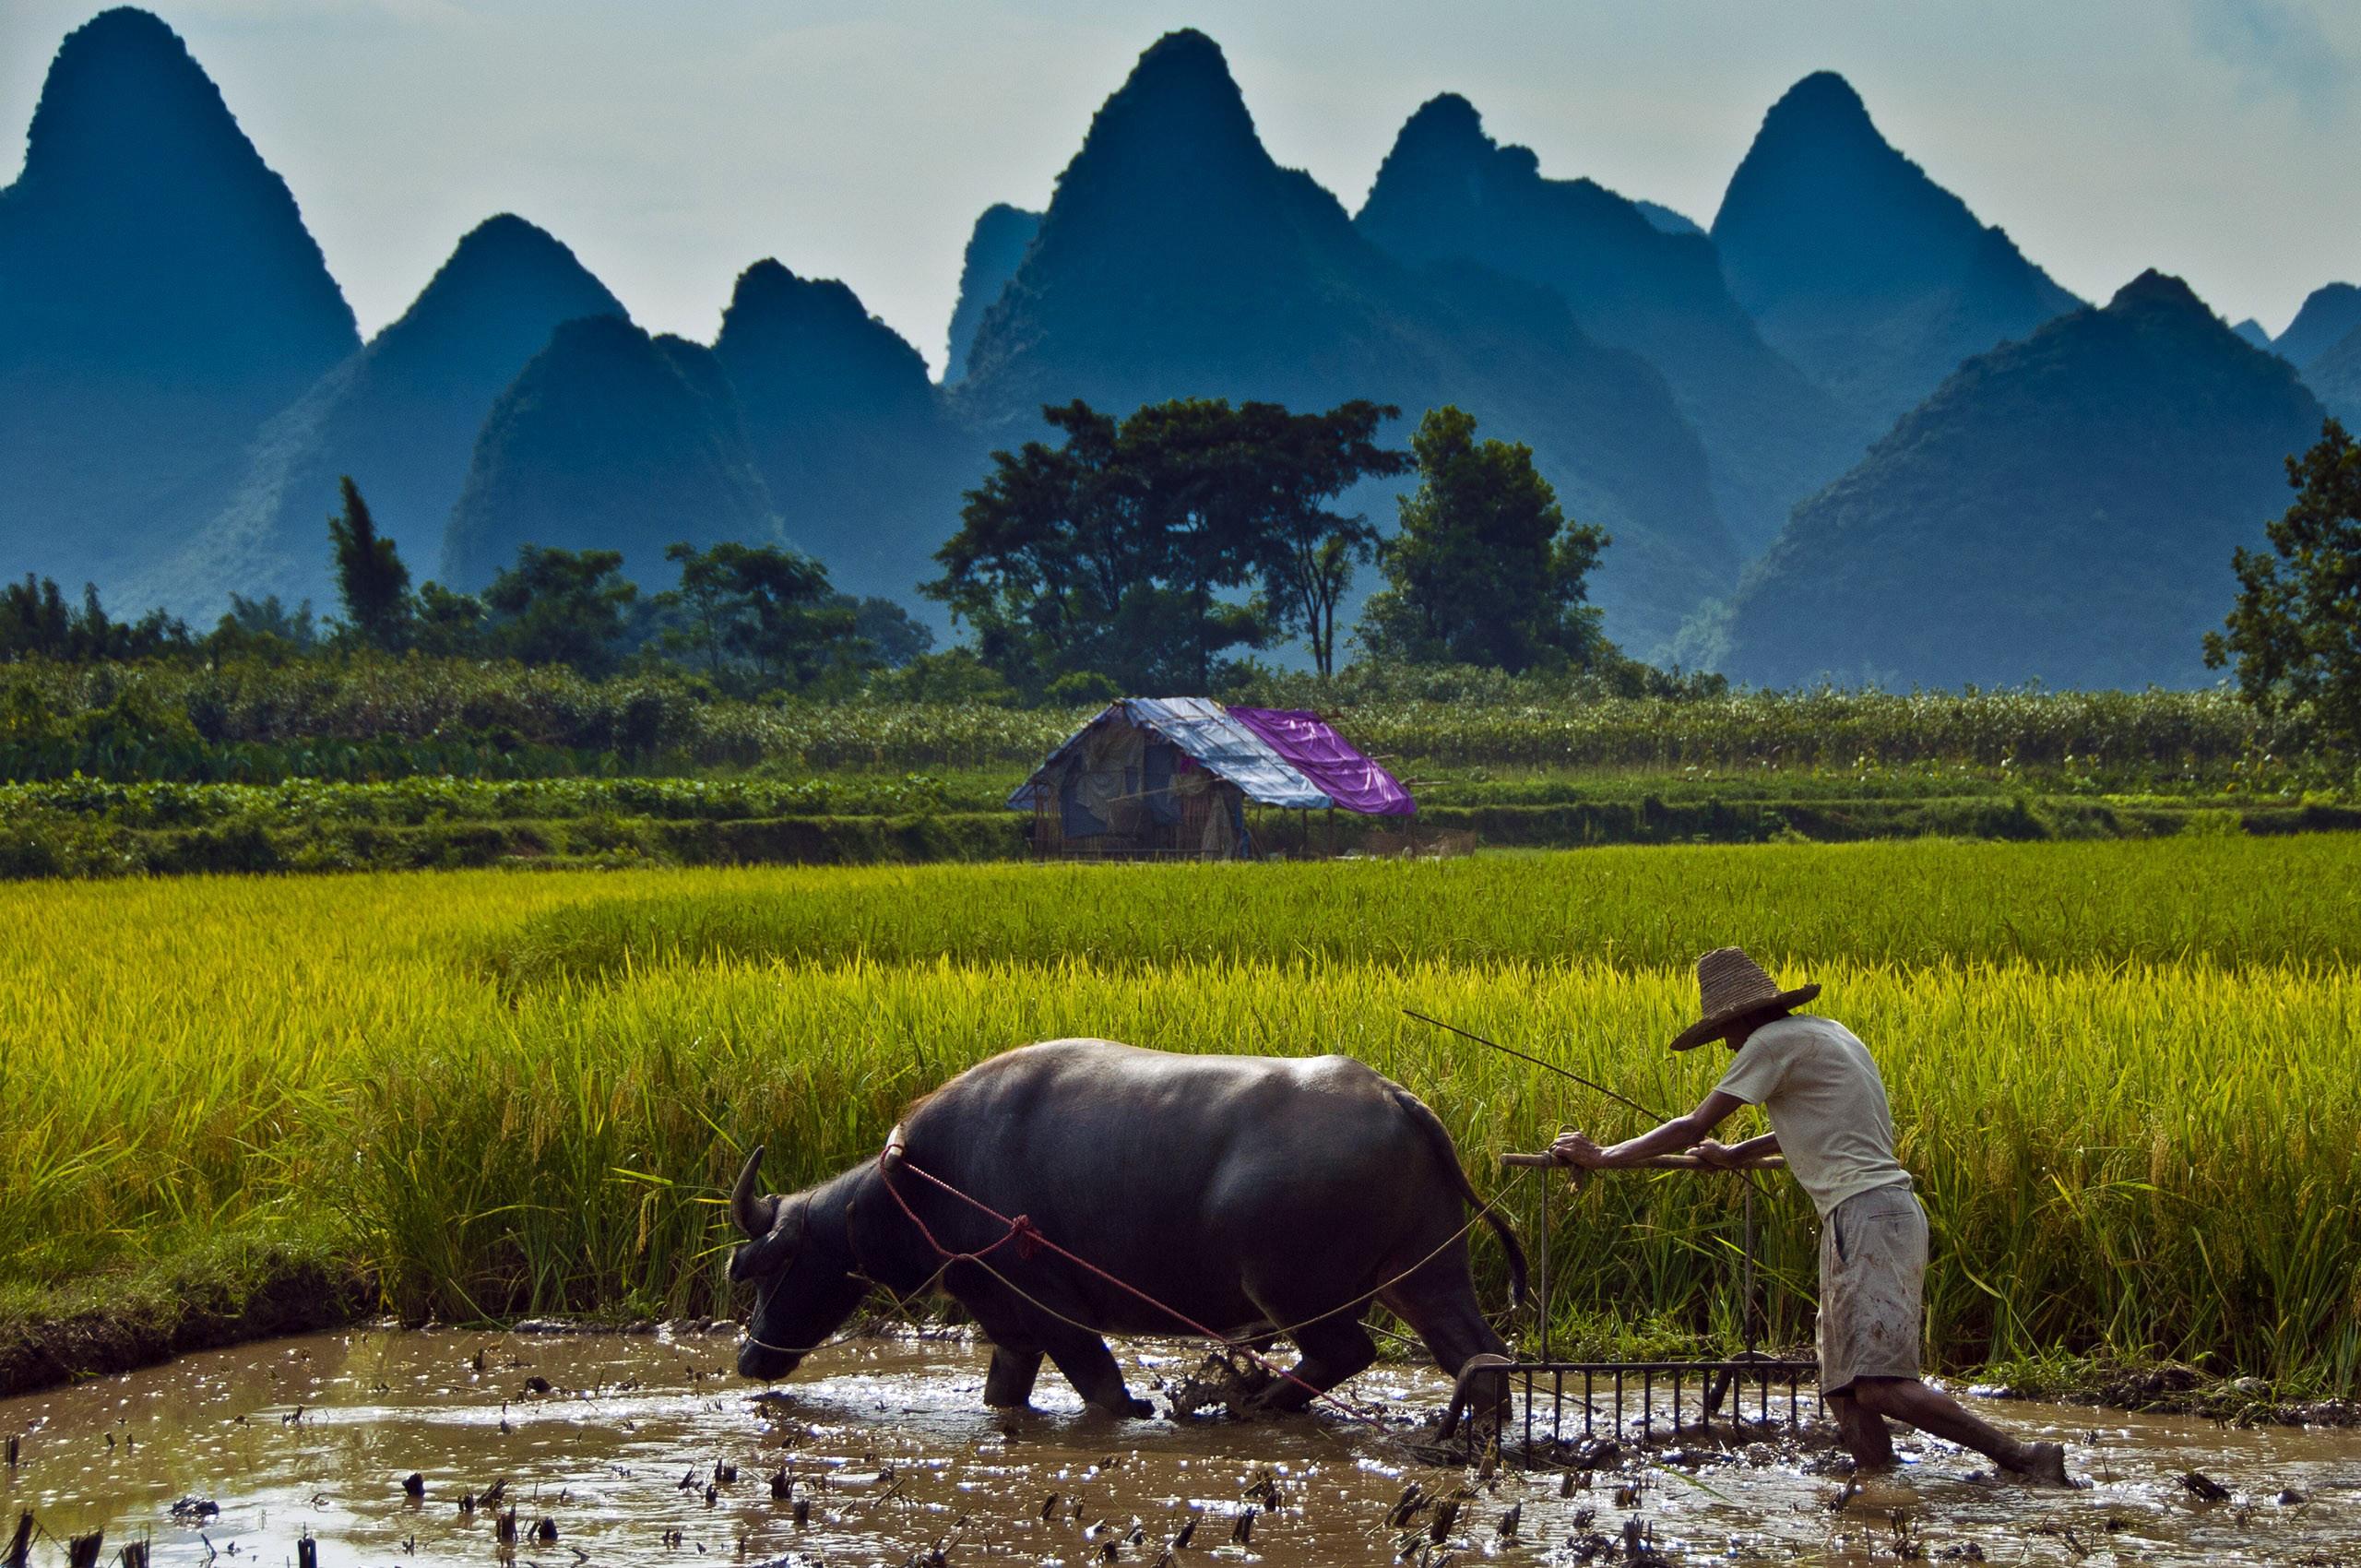 paddy farmers water buffaloes man landscape fields photo 2560x1700